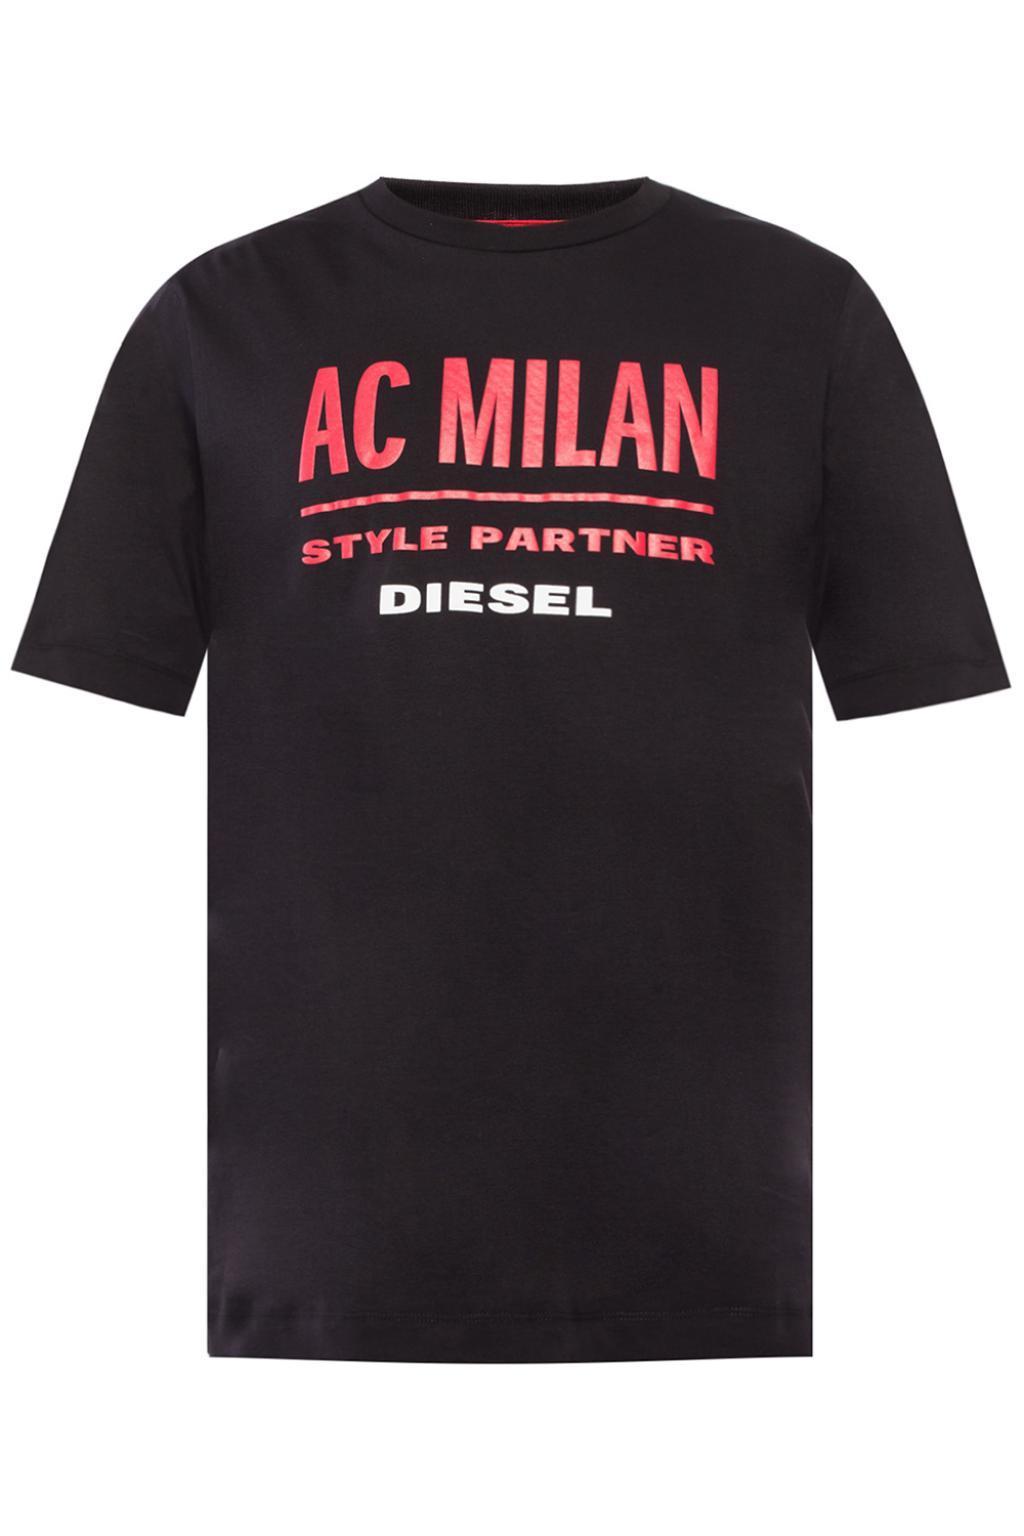 DIESEL X Ac Milan in Black for Men - Save 4% - Lyst 08383bb12